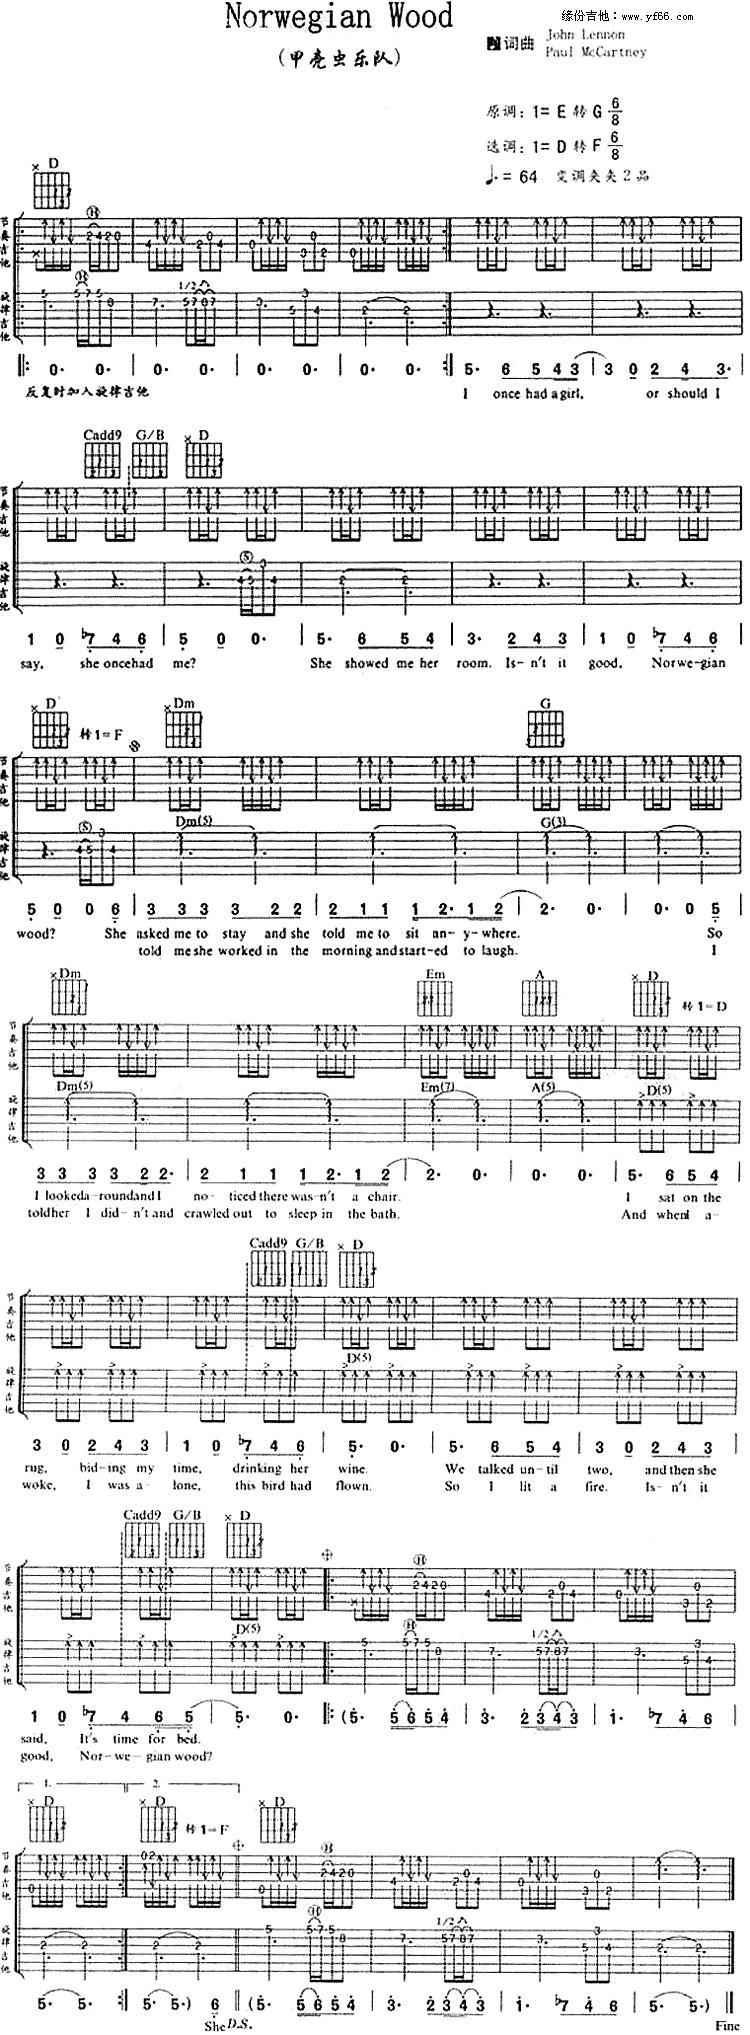 the beatles披头士的挪威的森林 吉他谱 跪求图片